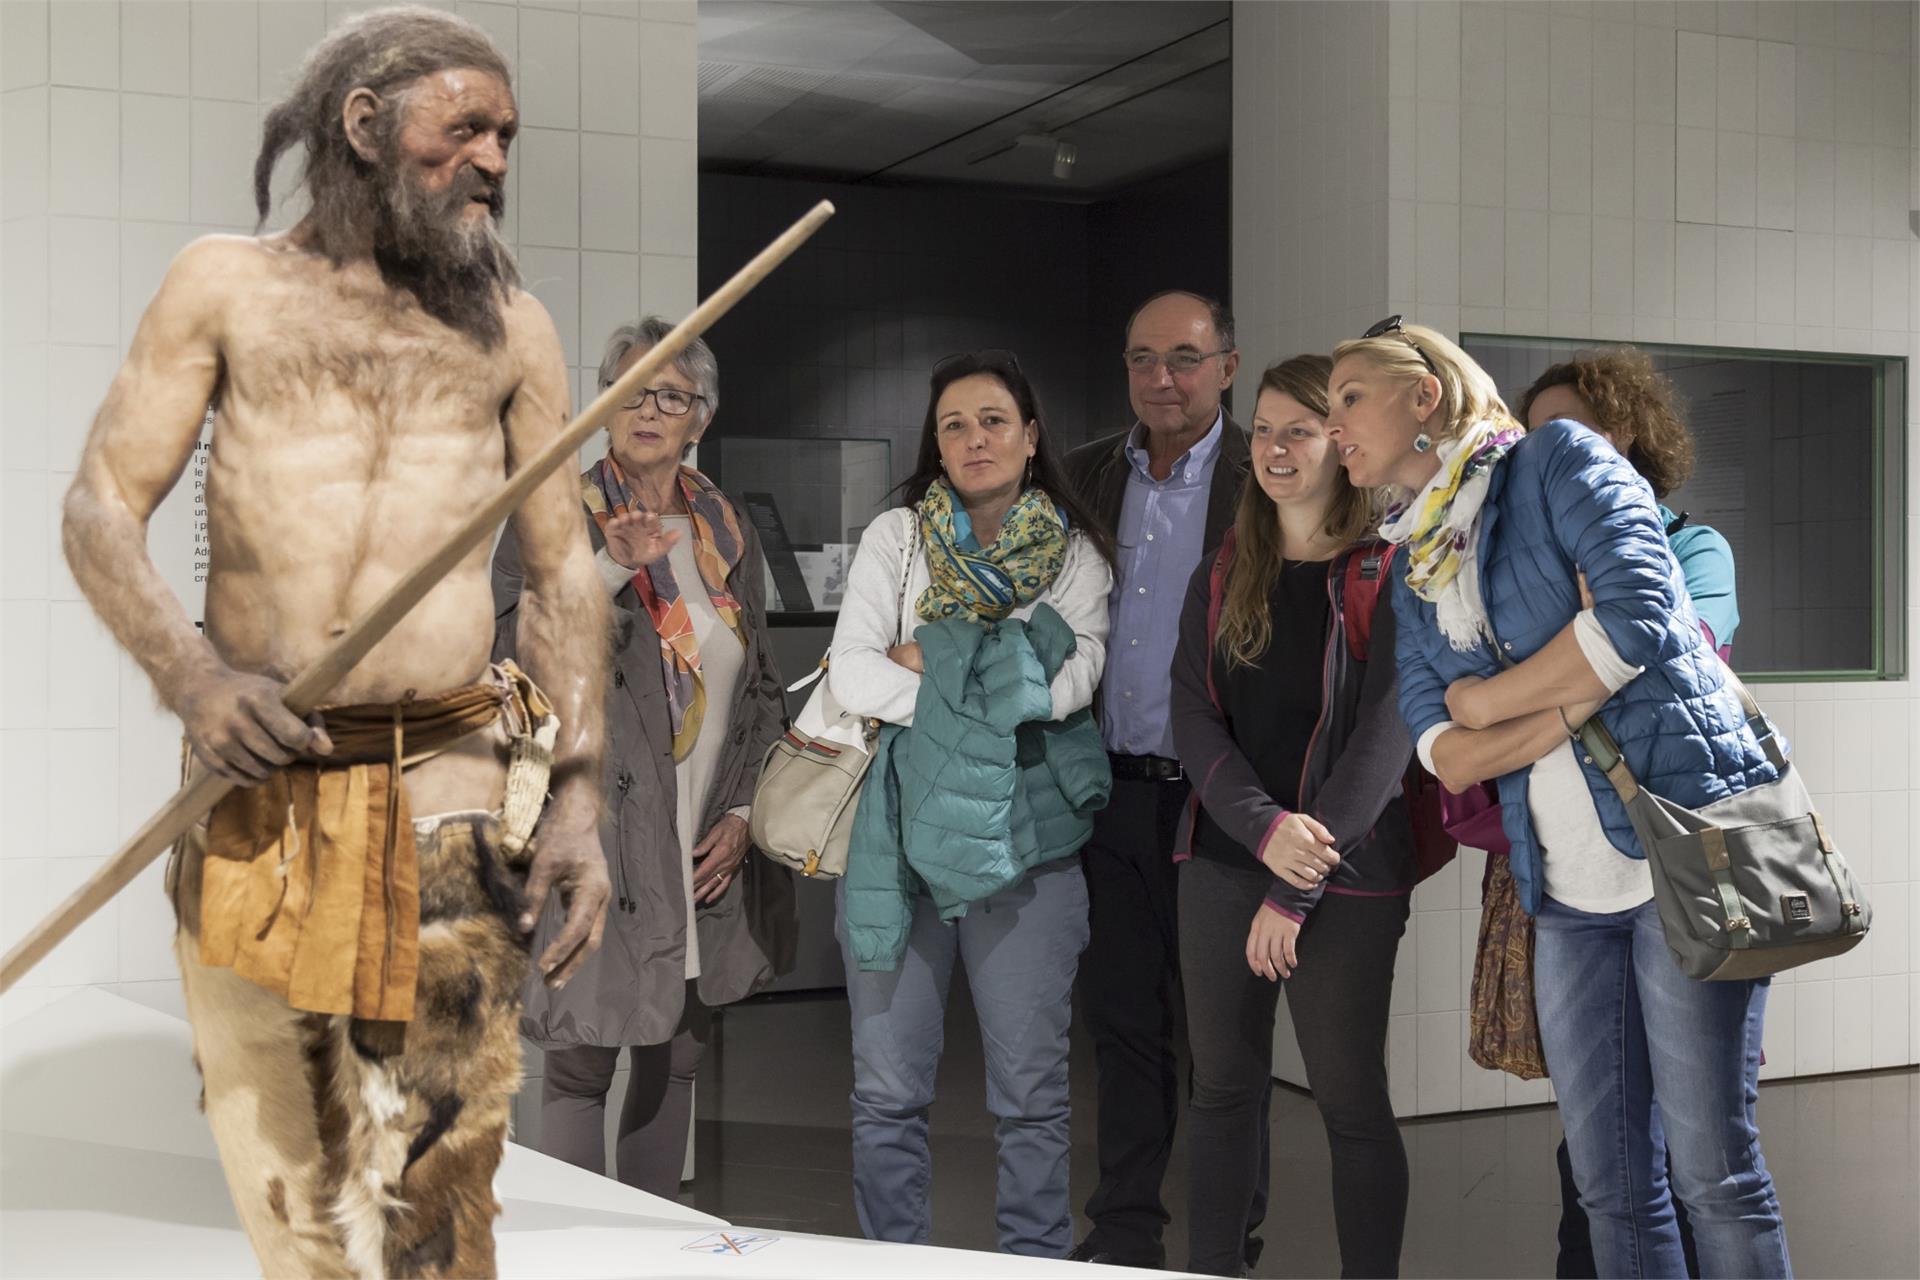 Südtiroler Archäologiemuseum - Ötzi